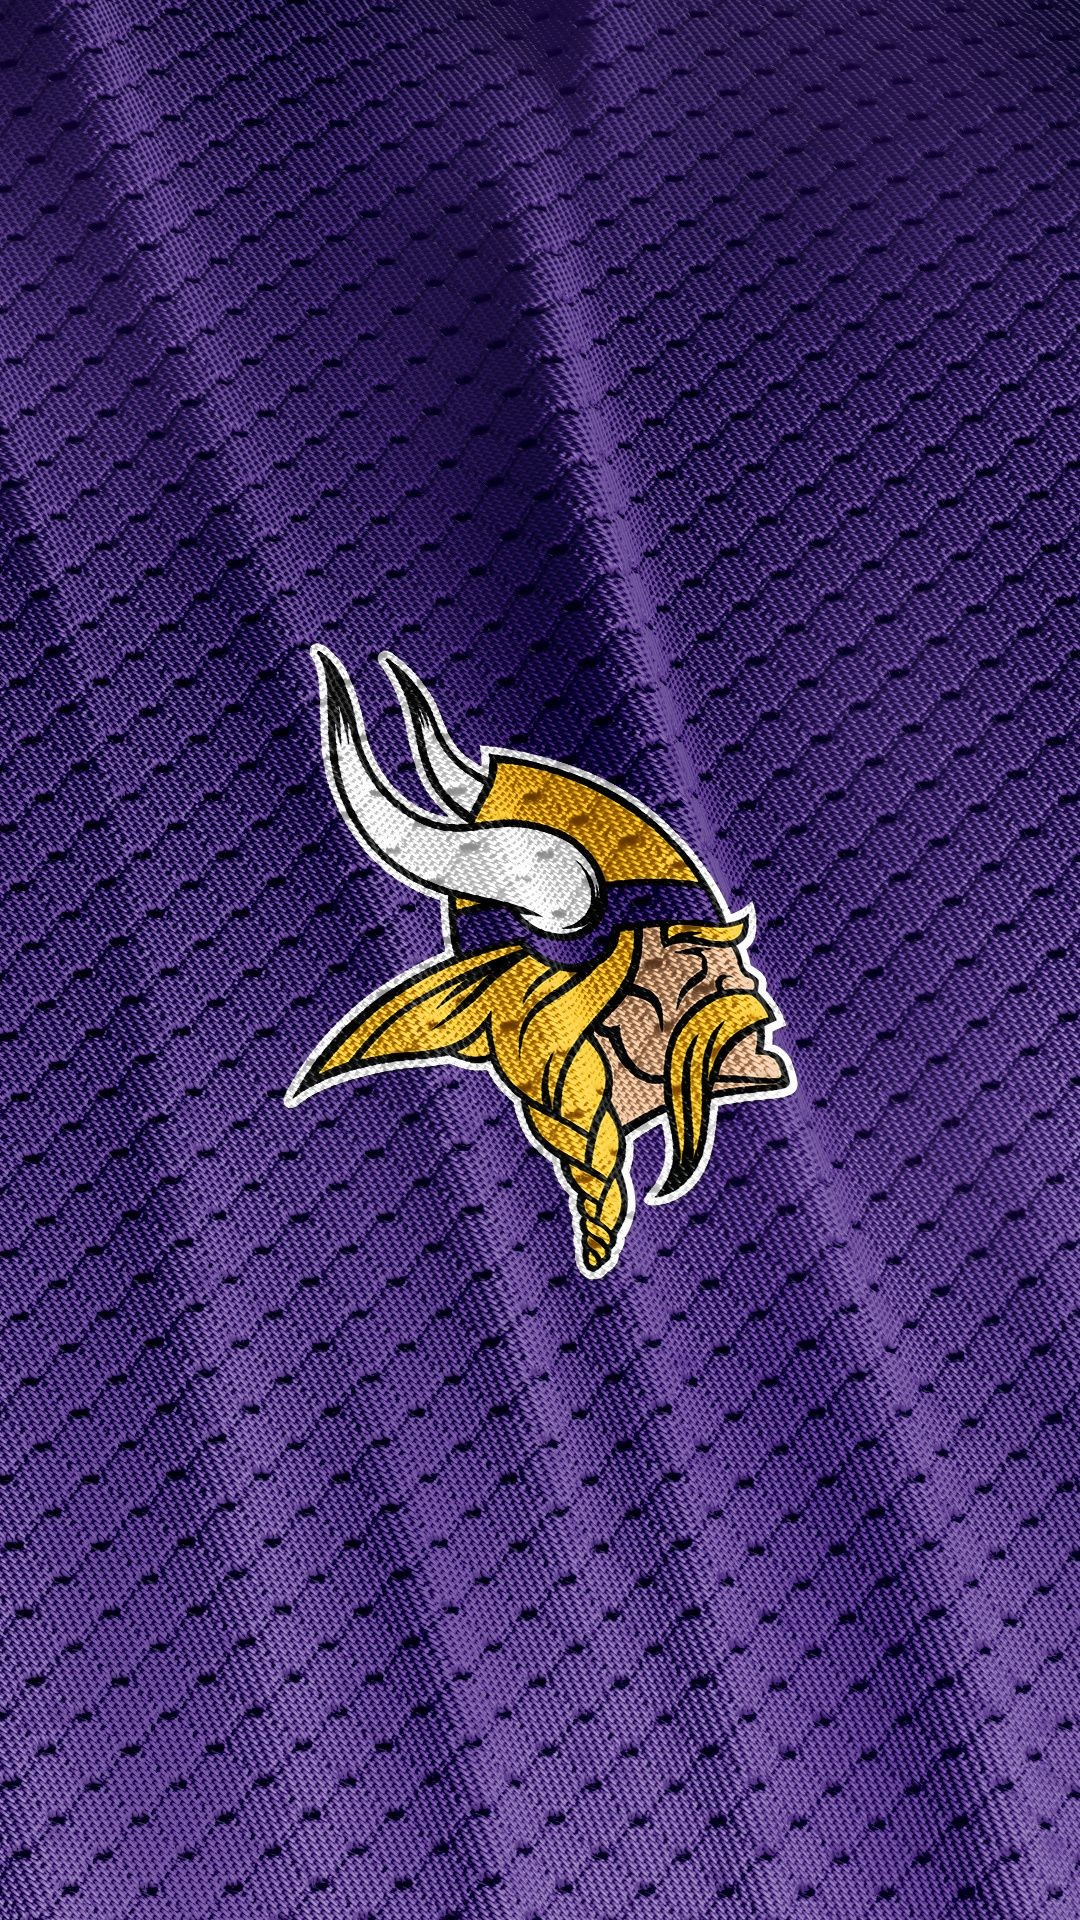 Res: 1080x1920, Minnesota Vikings Wallpaper Elegant Vikings Logo iPhone Wallpaper …  Download wallpaper